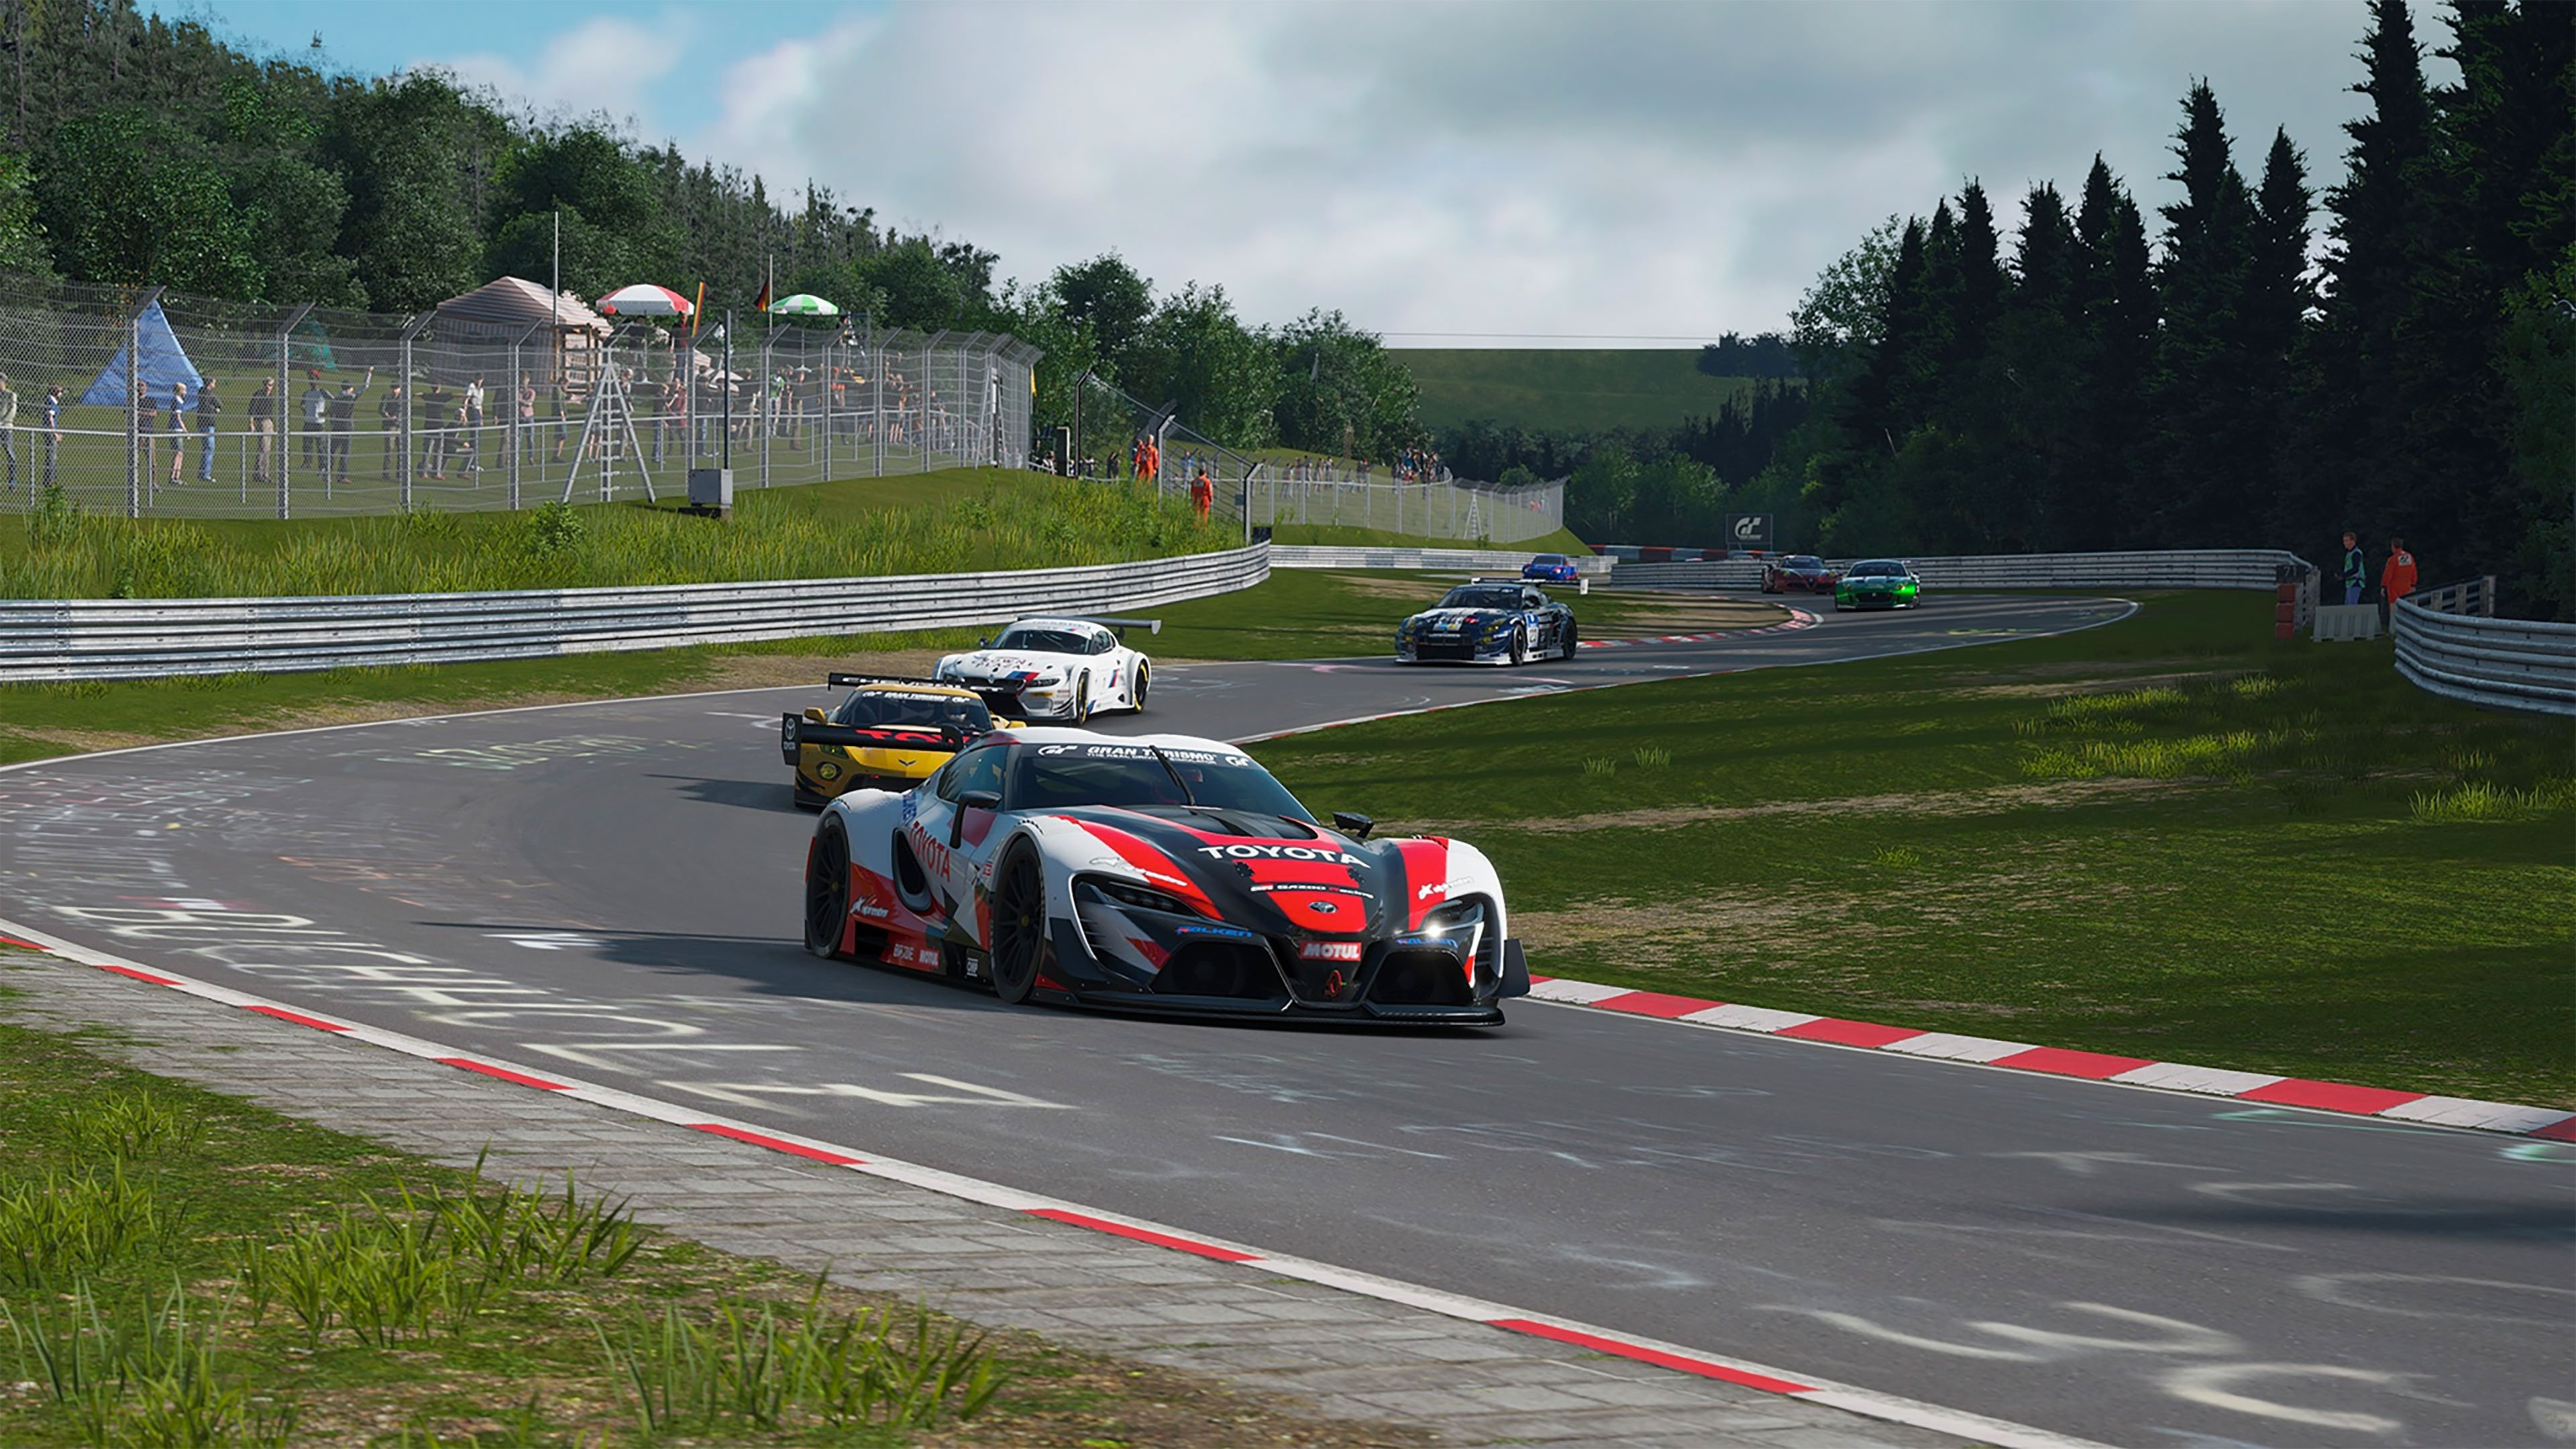 Gran Turismo Sport Wallpapers in Ultra HD 4K   Gameranx 3840x2160